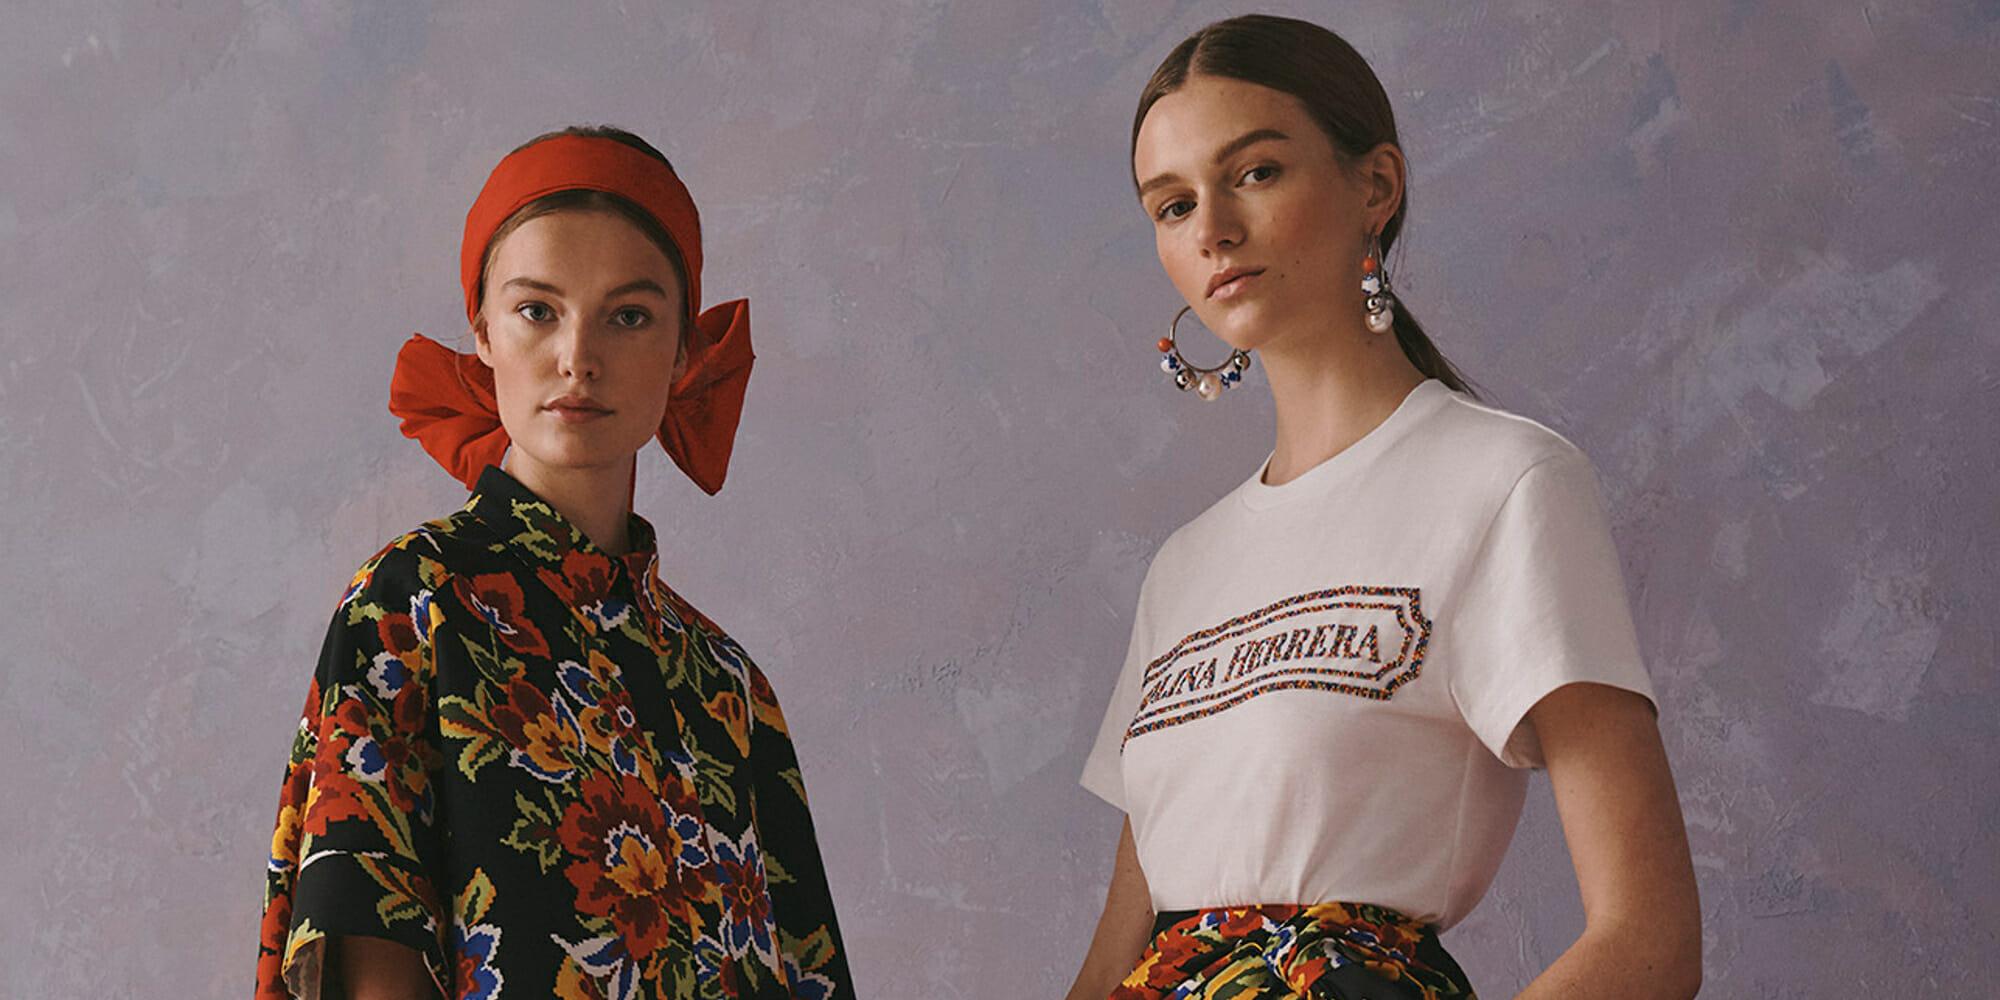 Carolina Herrera Official Site Avant Elegant Fashion